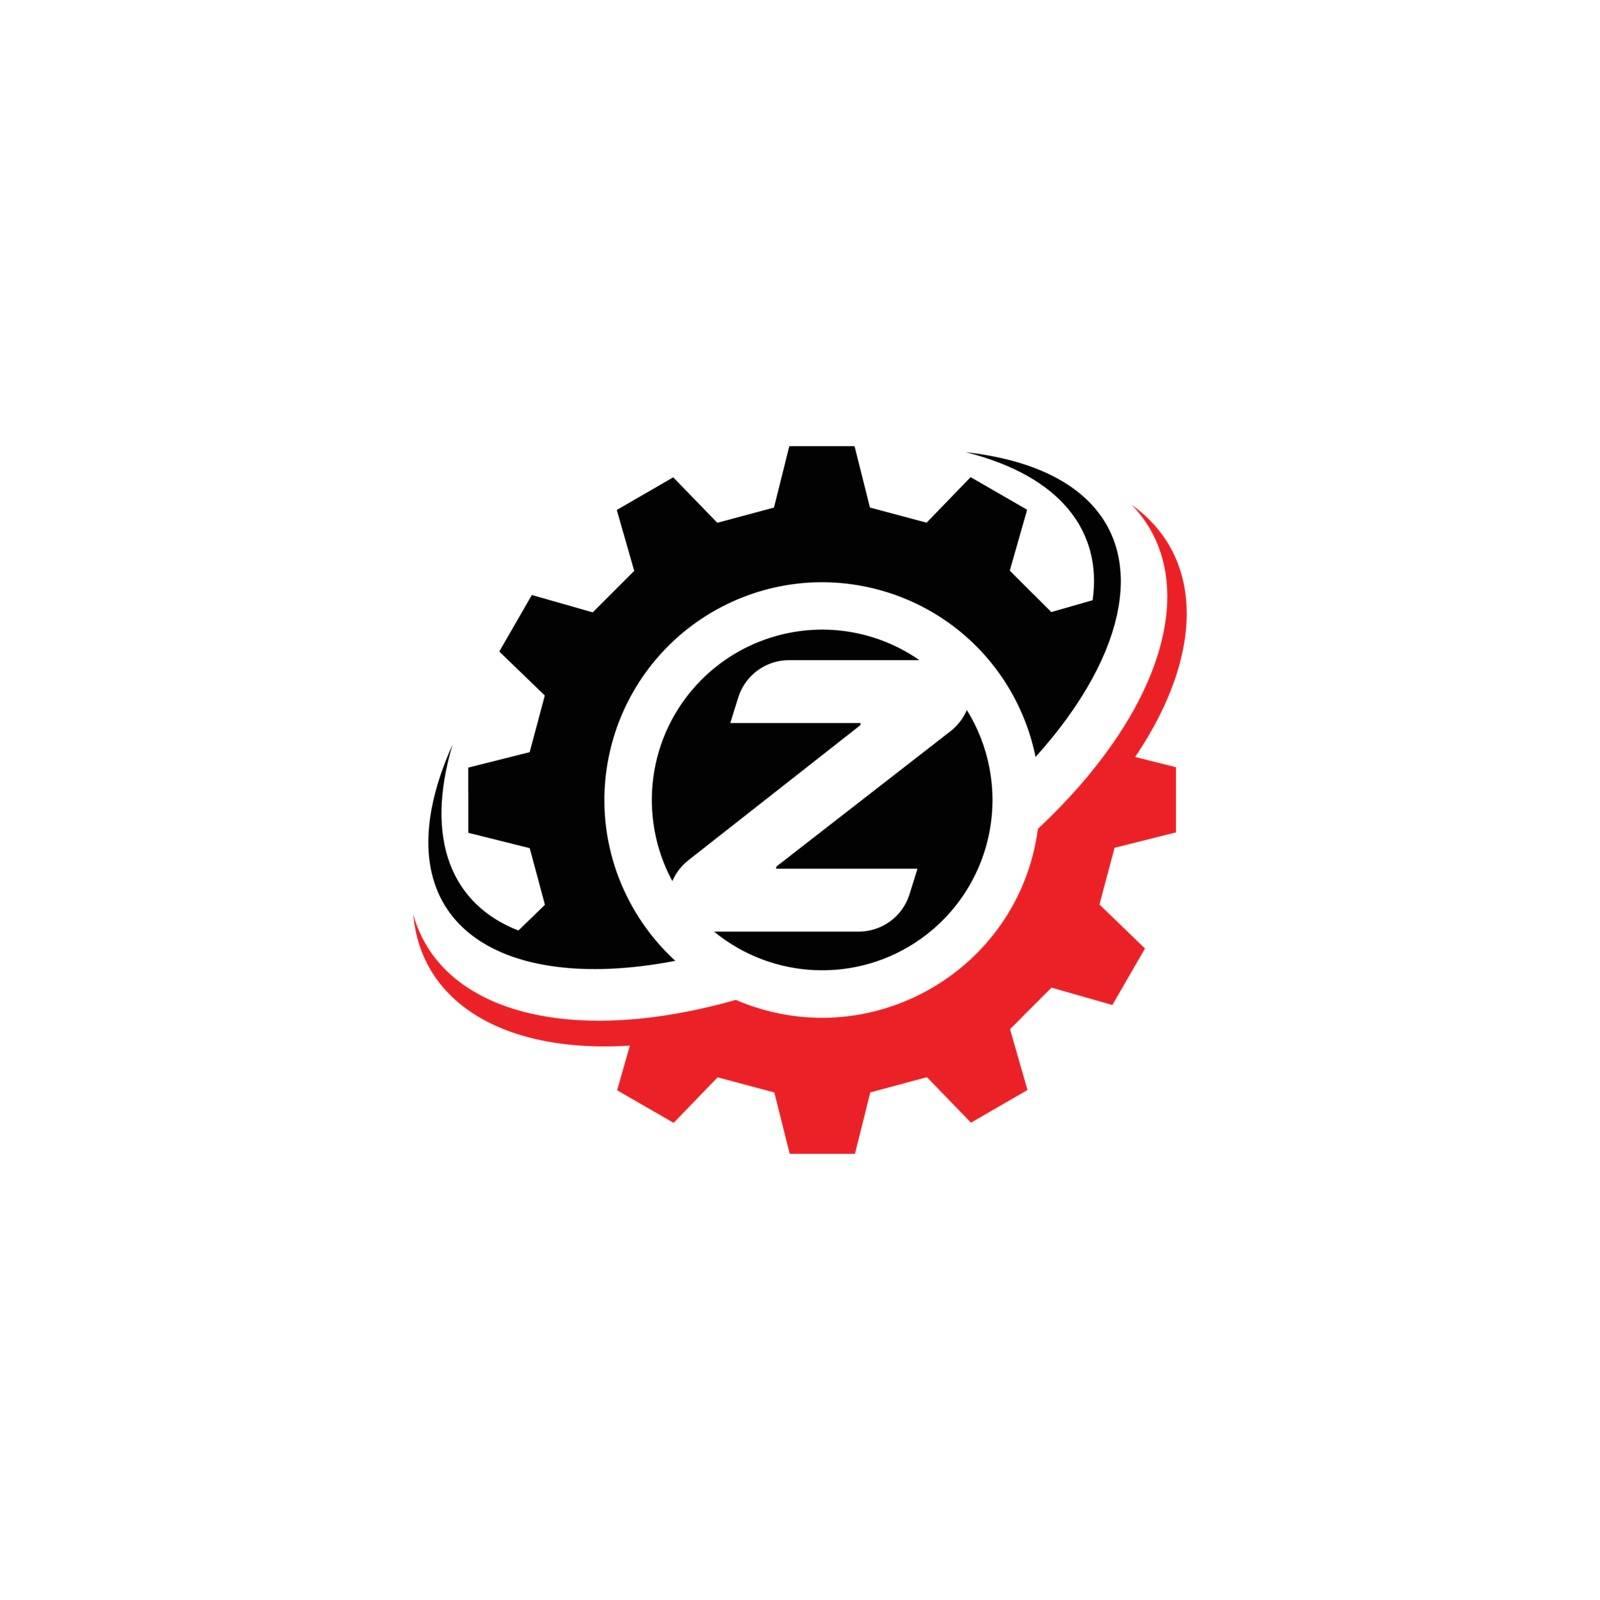 Letter Z Gear Logo Design Template